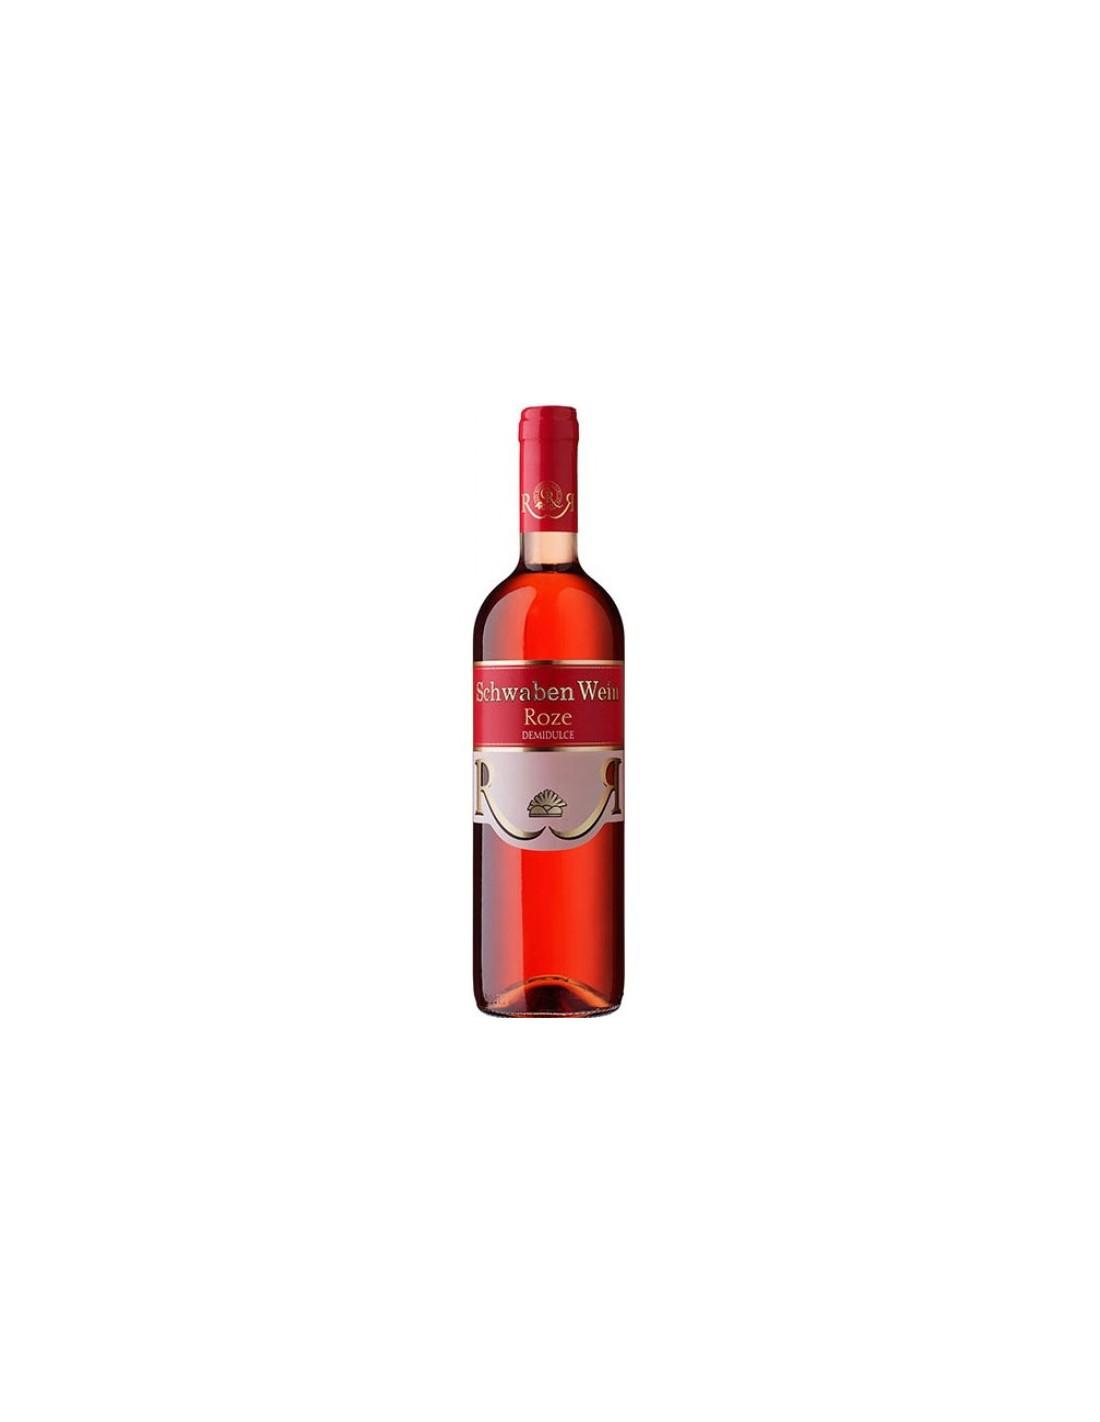 Vin roze demidulce, Schwaben Wein Recas, 0.75L, 12.5% alc., Romania